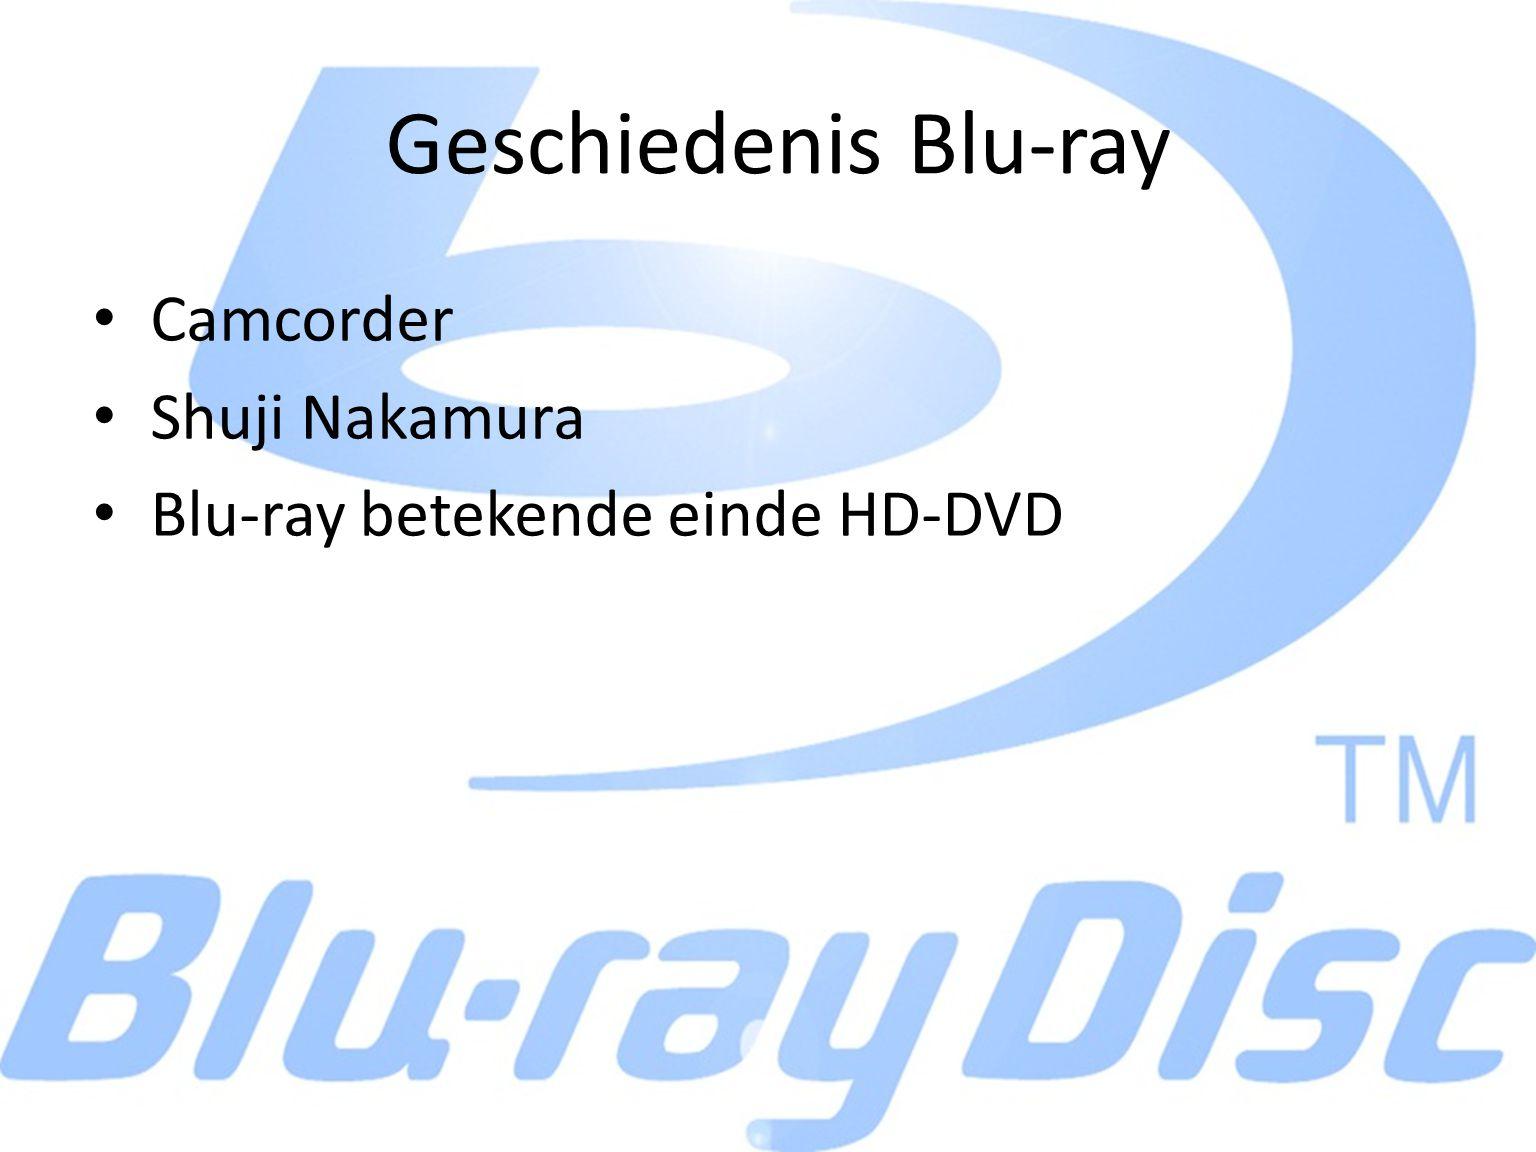 Geschiedenis Blu-ray Camcorder Shuji Nakamura Blu-ray betekende einde HD-DVD